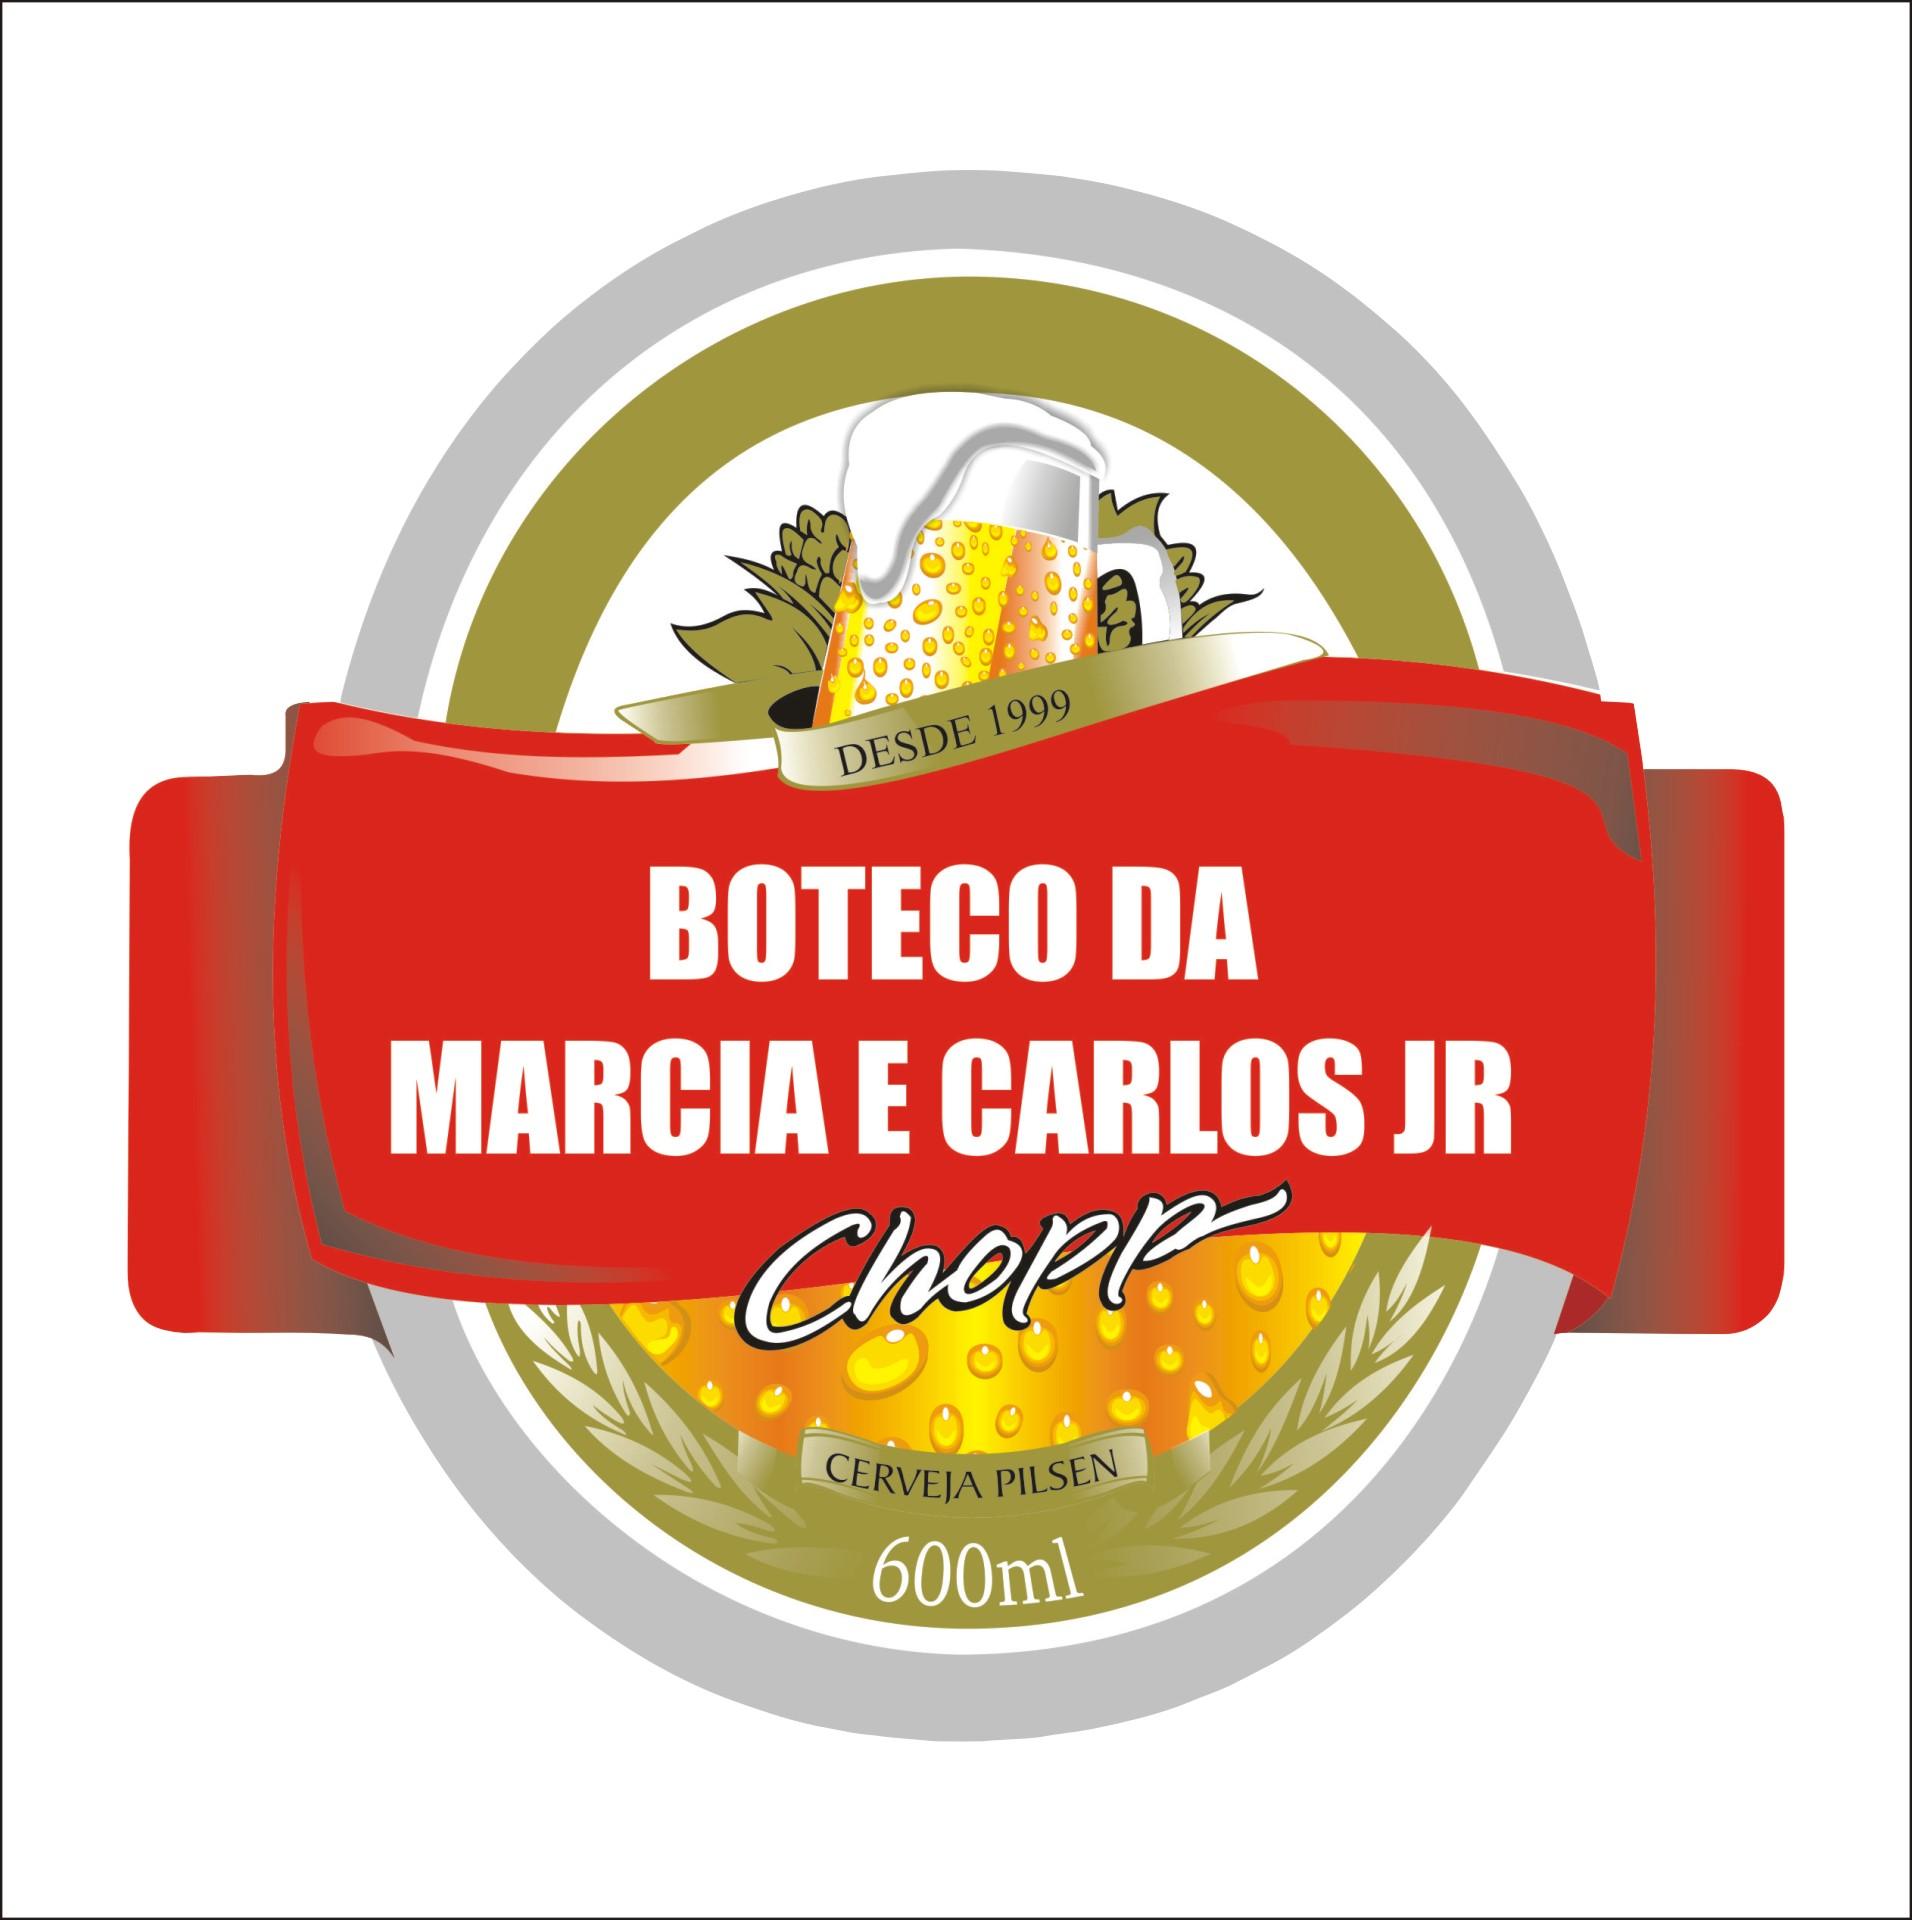 Tapetes Artesanato Mineiro ~ Banner adesivo tema boteco Allink Elo7